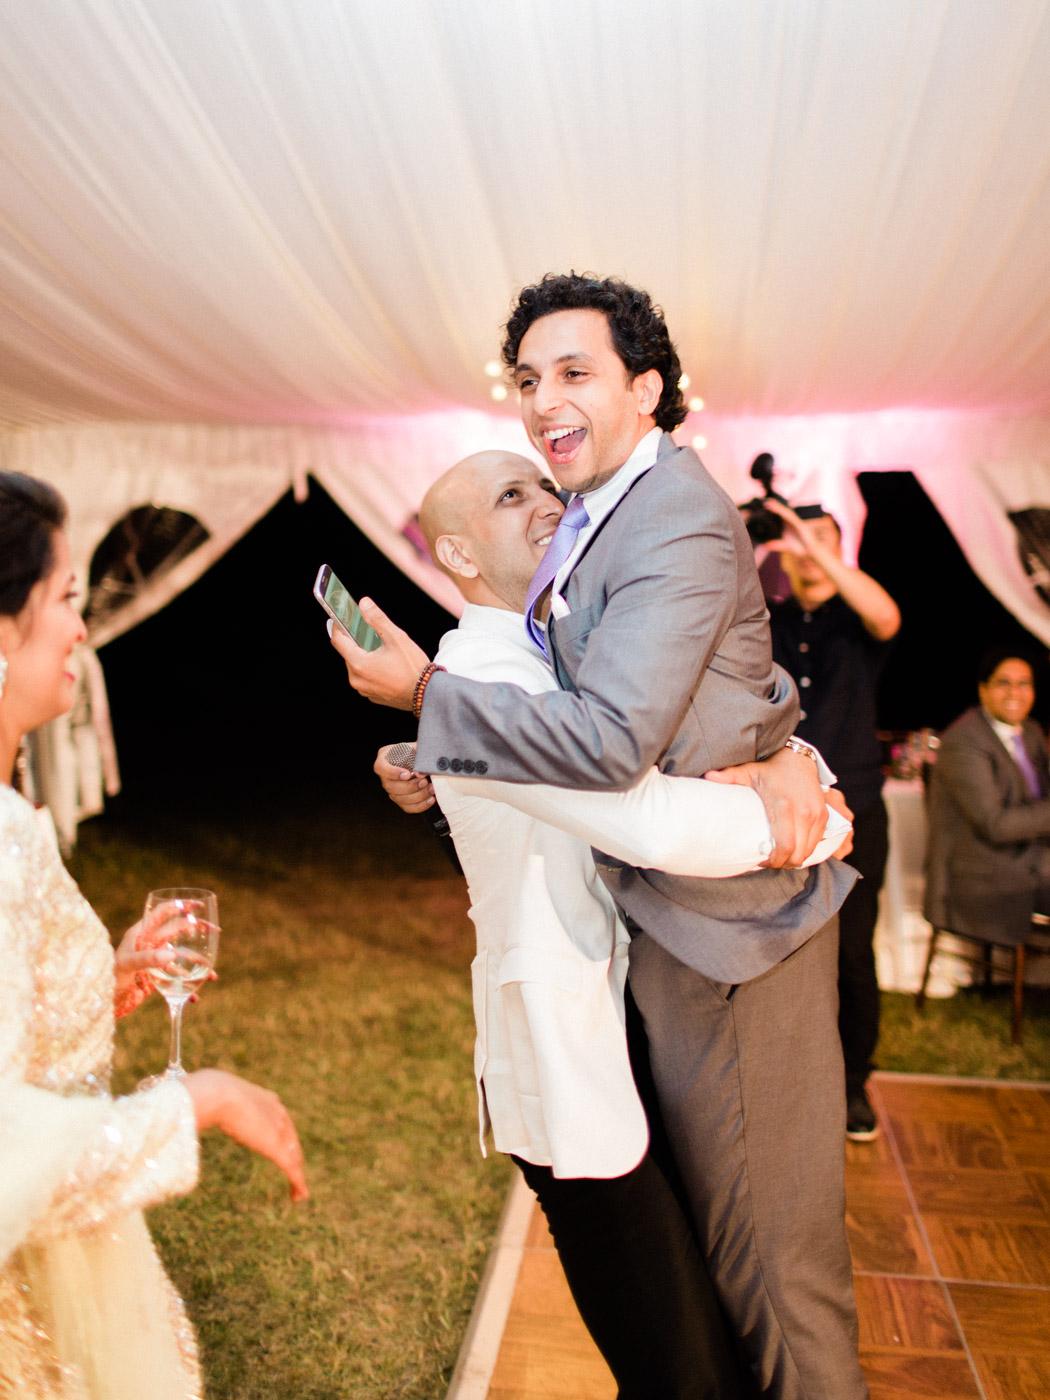 Toronto-Collingwood-wedding-photographer-indian-wedding-documentary192.jpg